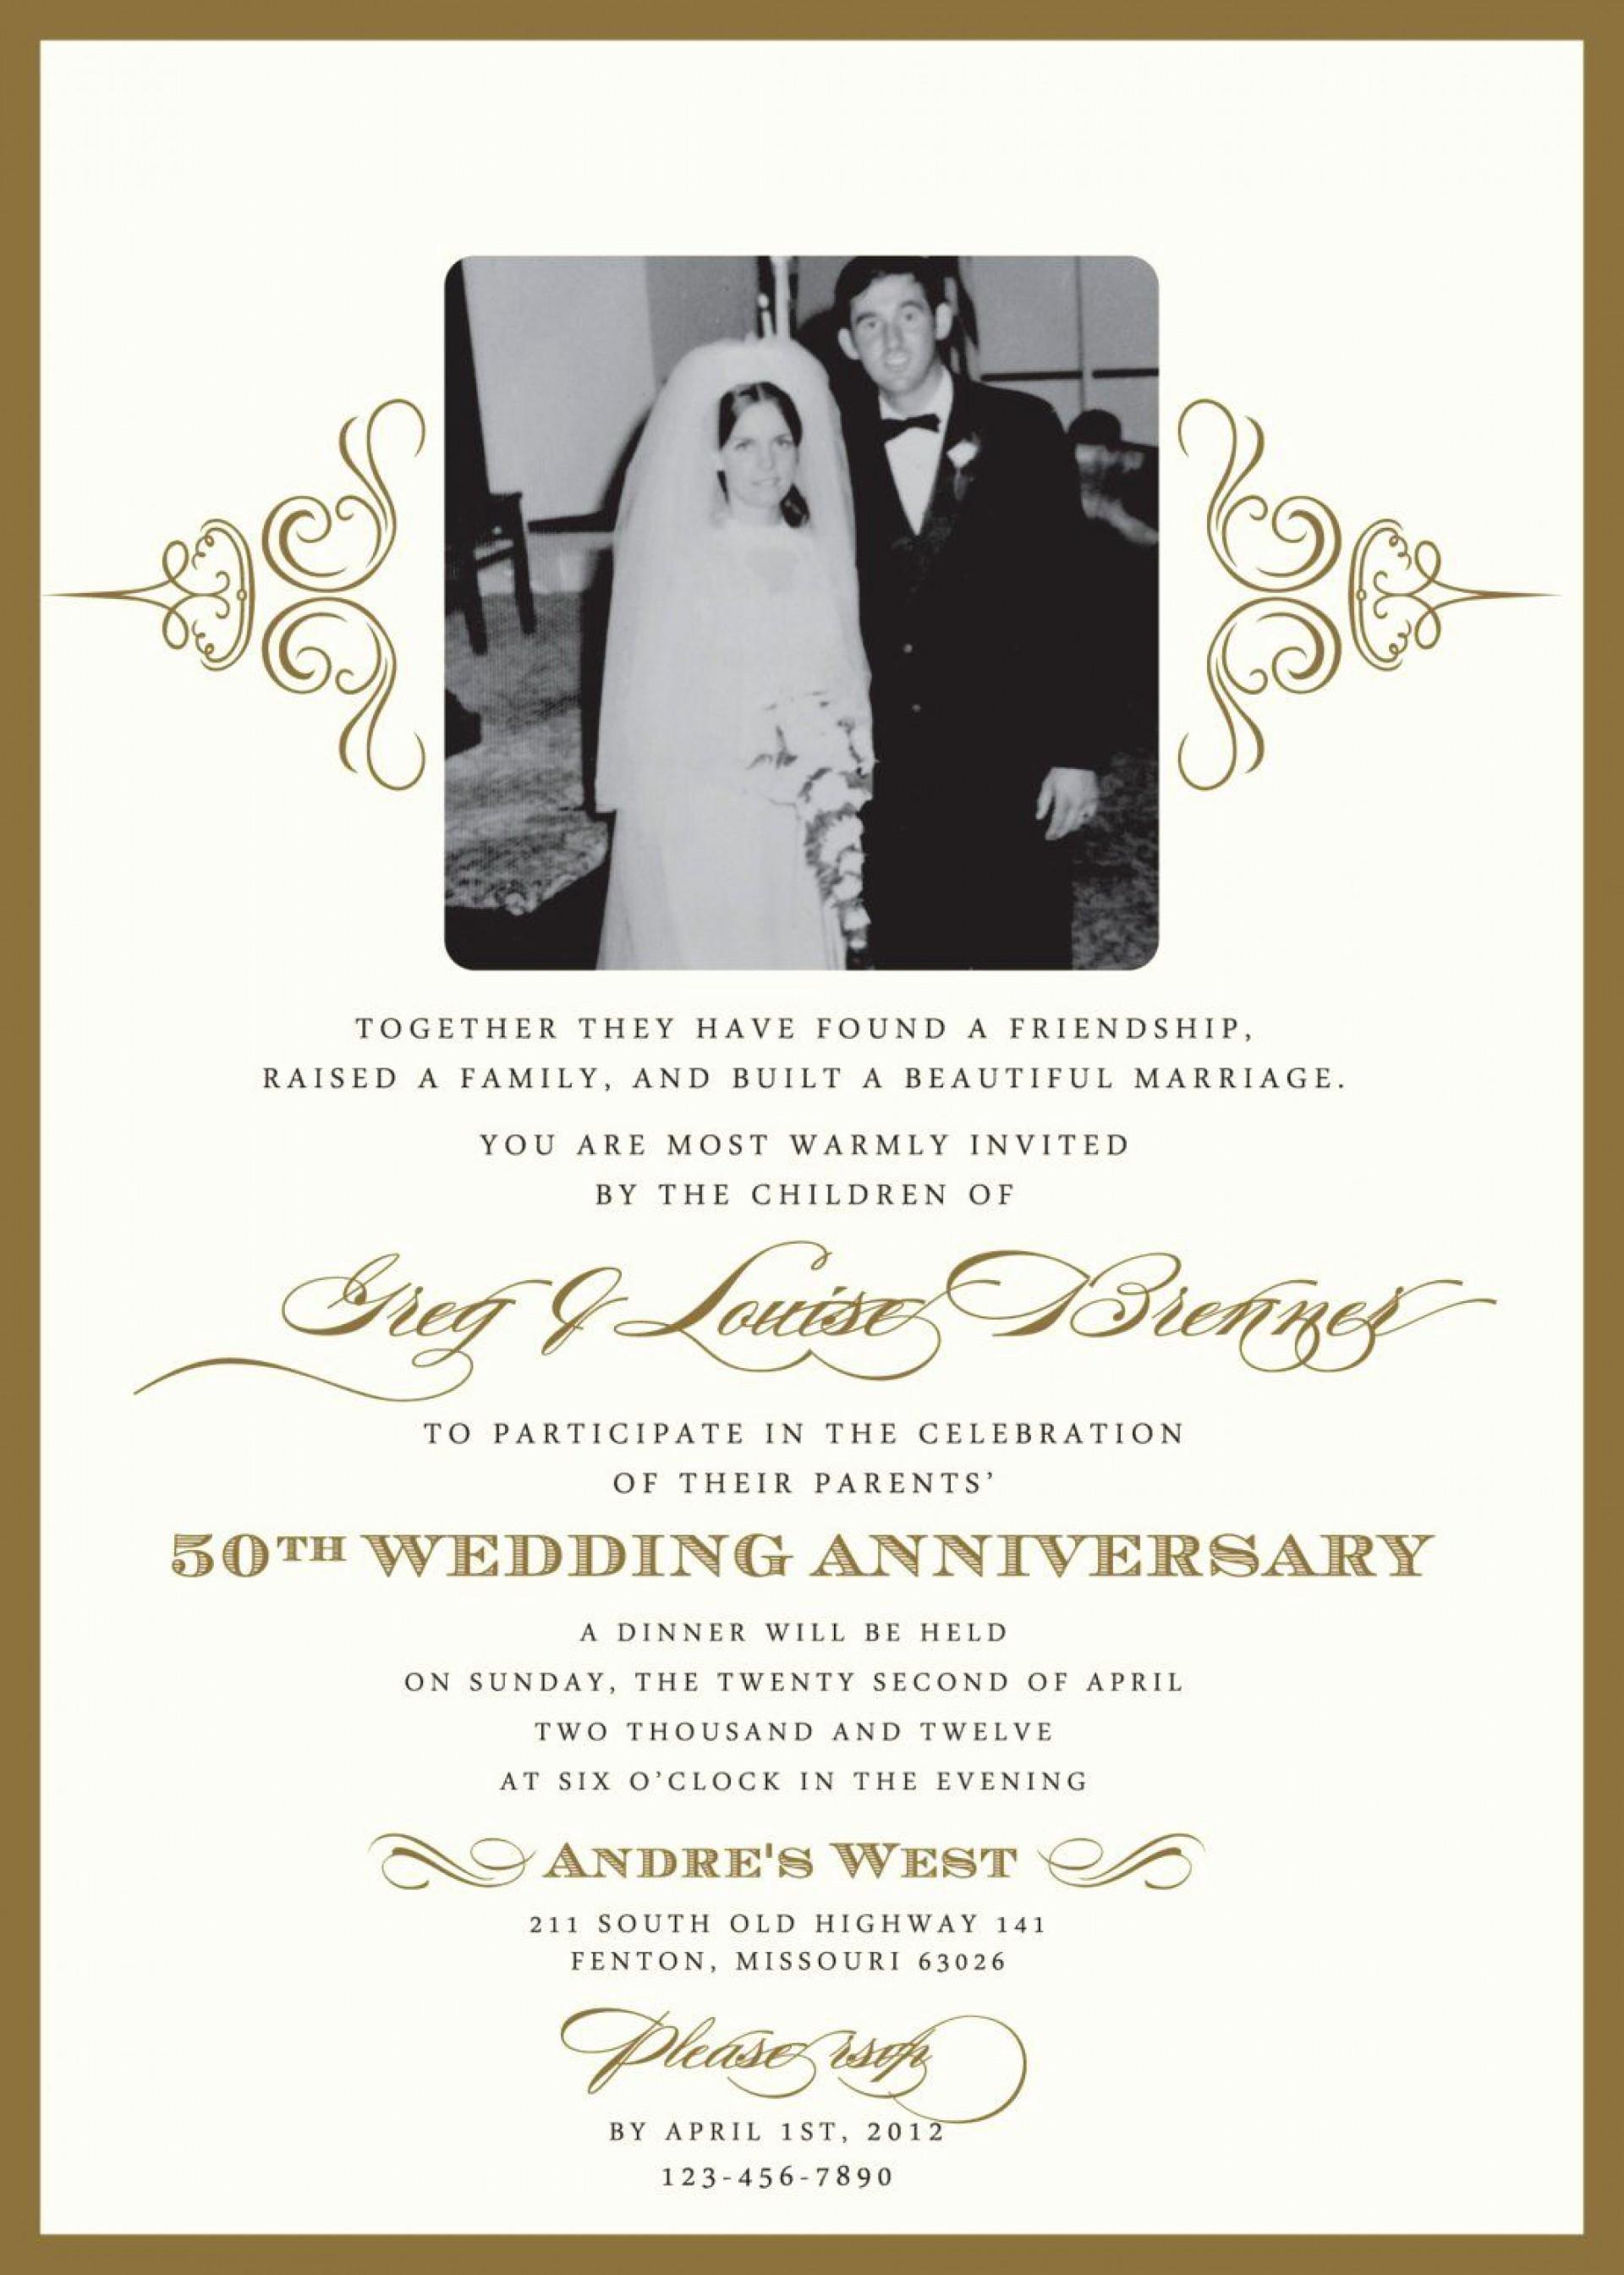 003 Striking Golden Wedding Anniversary Invitation Template Free Highest Clarity  50th Microsoft Word Download1920